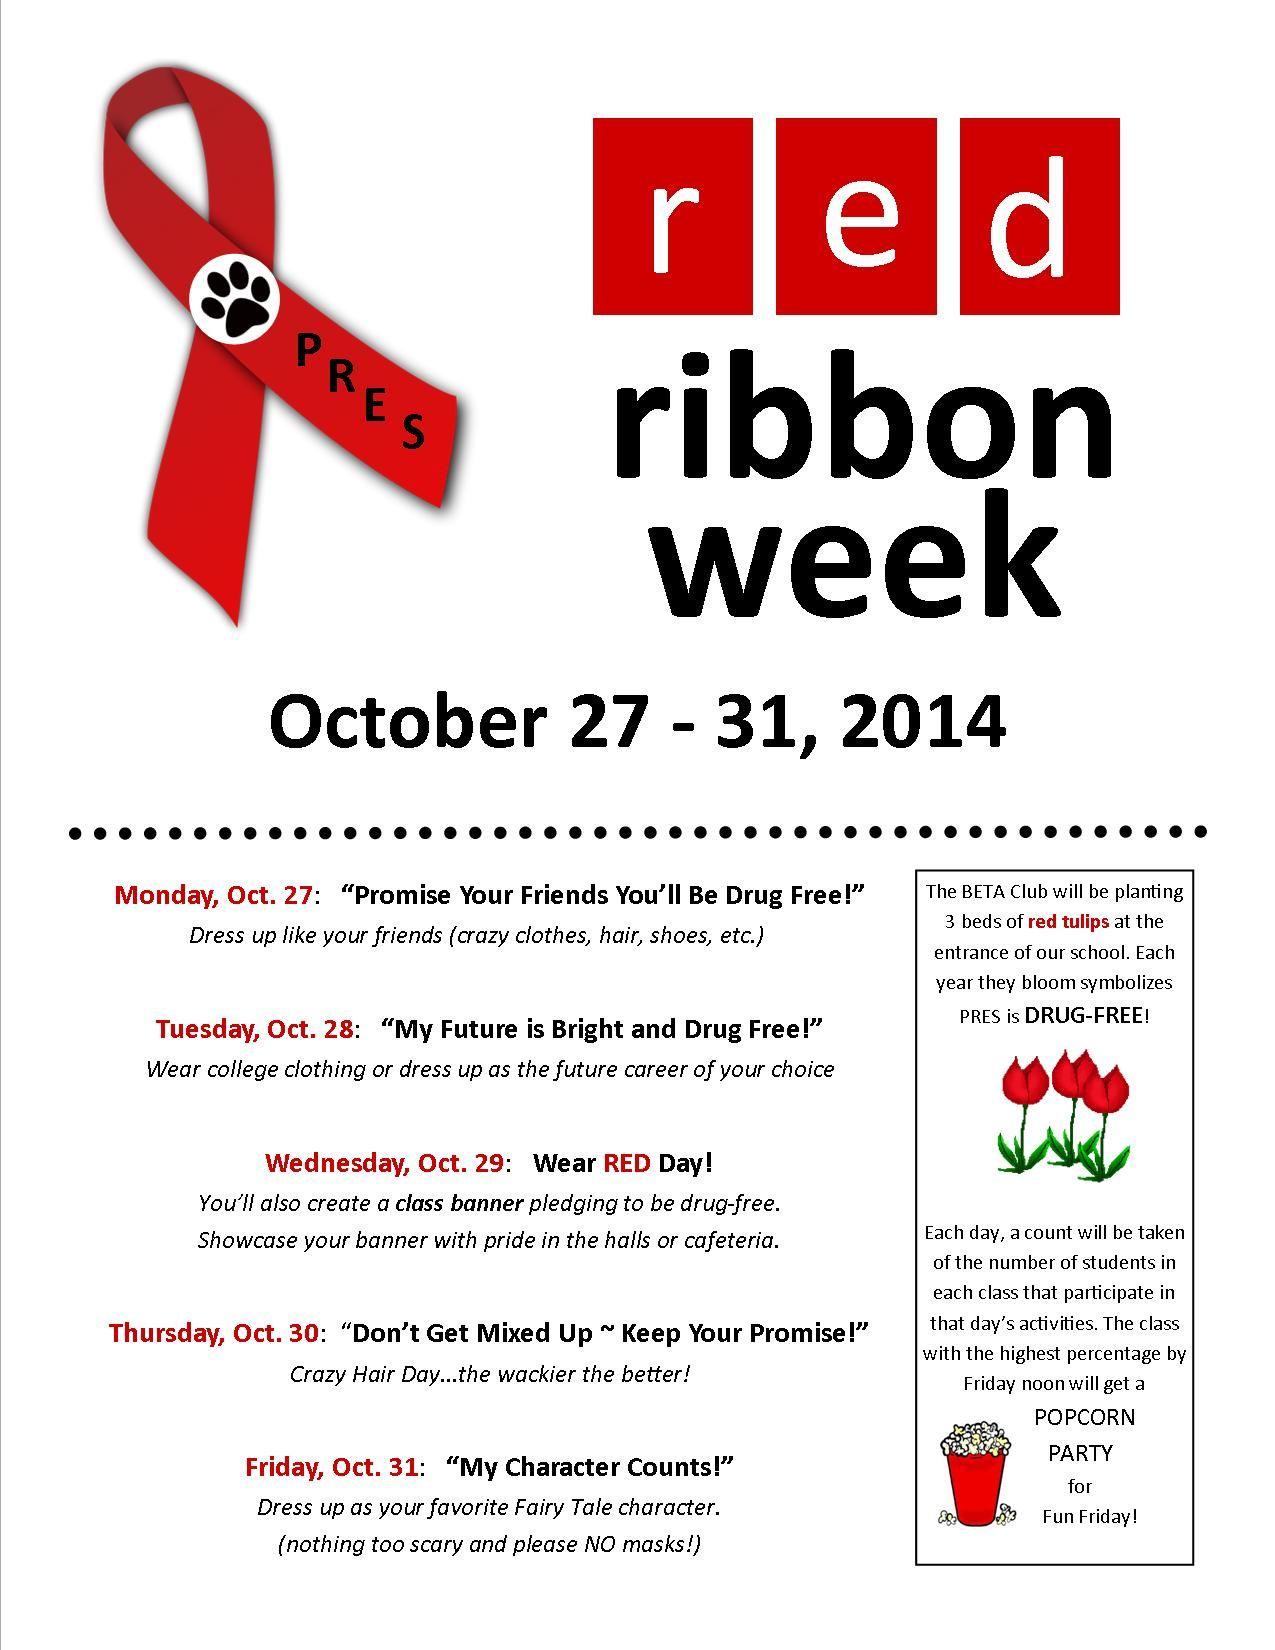 red ribbon week flyer template, red ribbon week flyer editable template, red ribbon week poster contest, red ribbon week posters